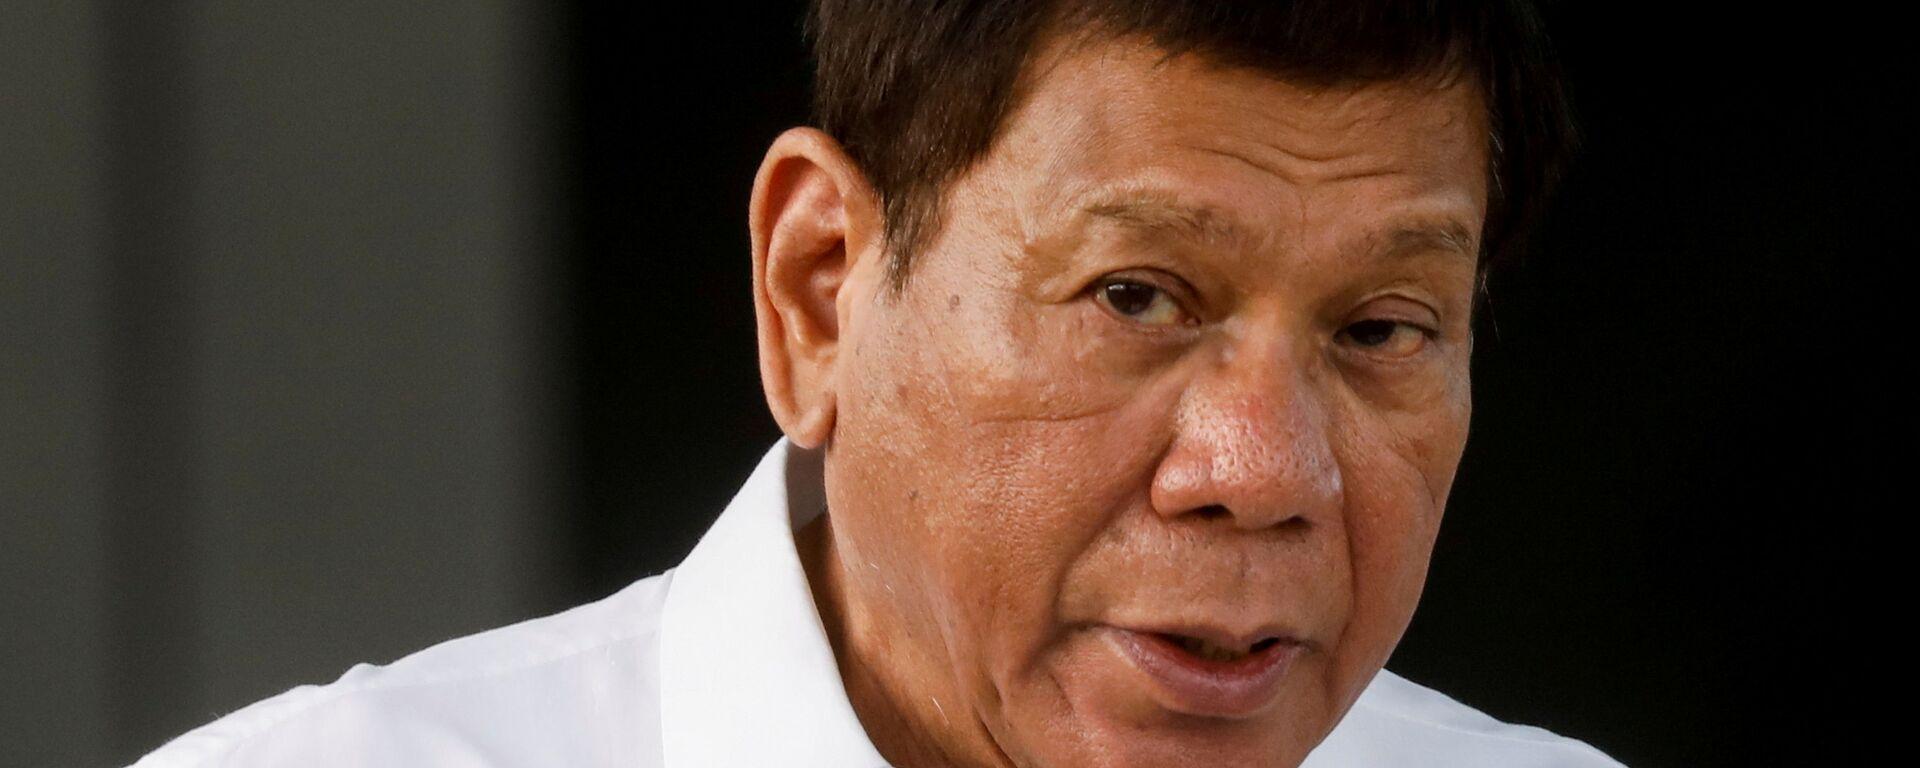 Tổng thống Philippines Rodrigo Duterte. - Sputnik Việt Nam, 1920, 02.10.2021